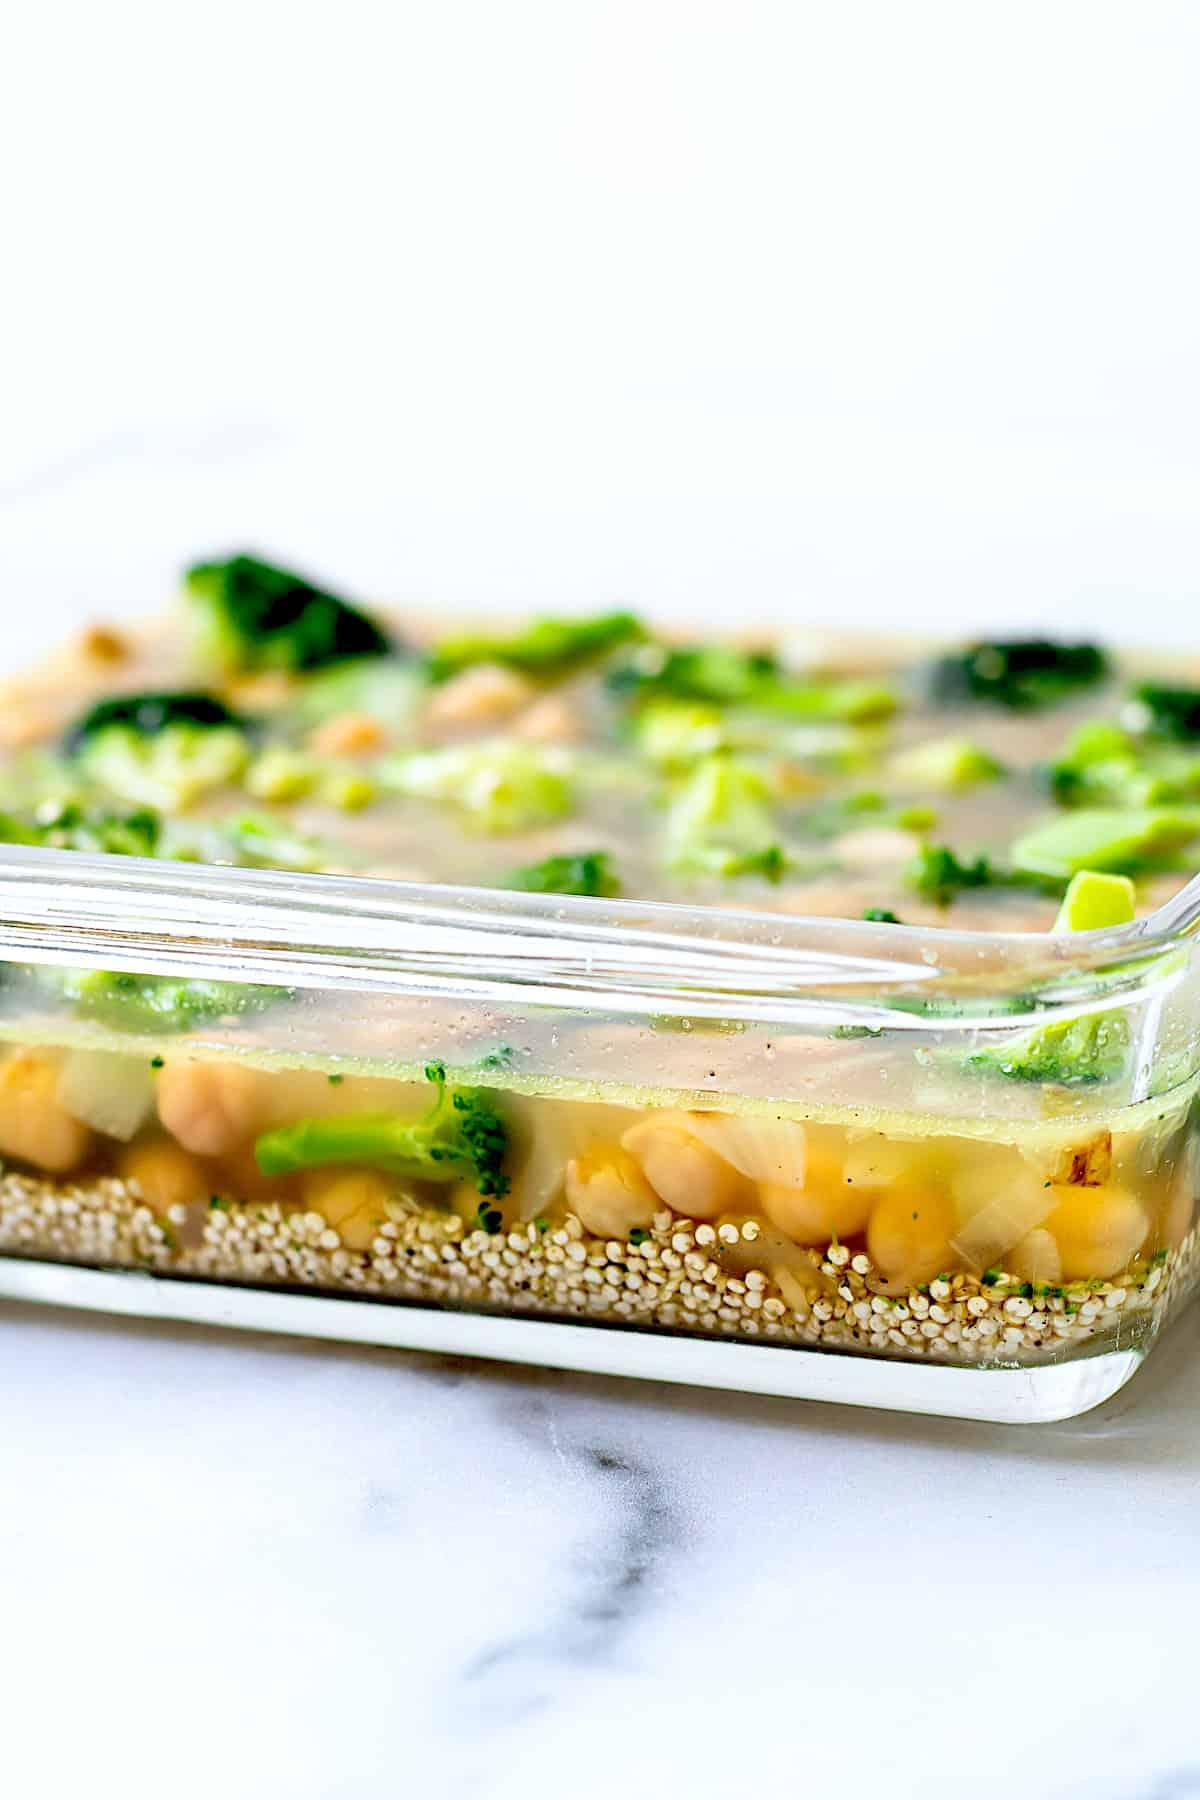 An unbaked broccoli Quinoa Casserole